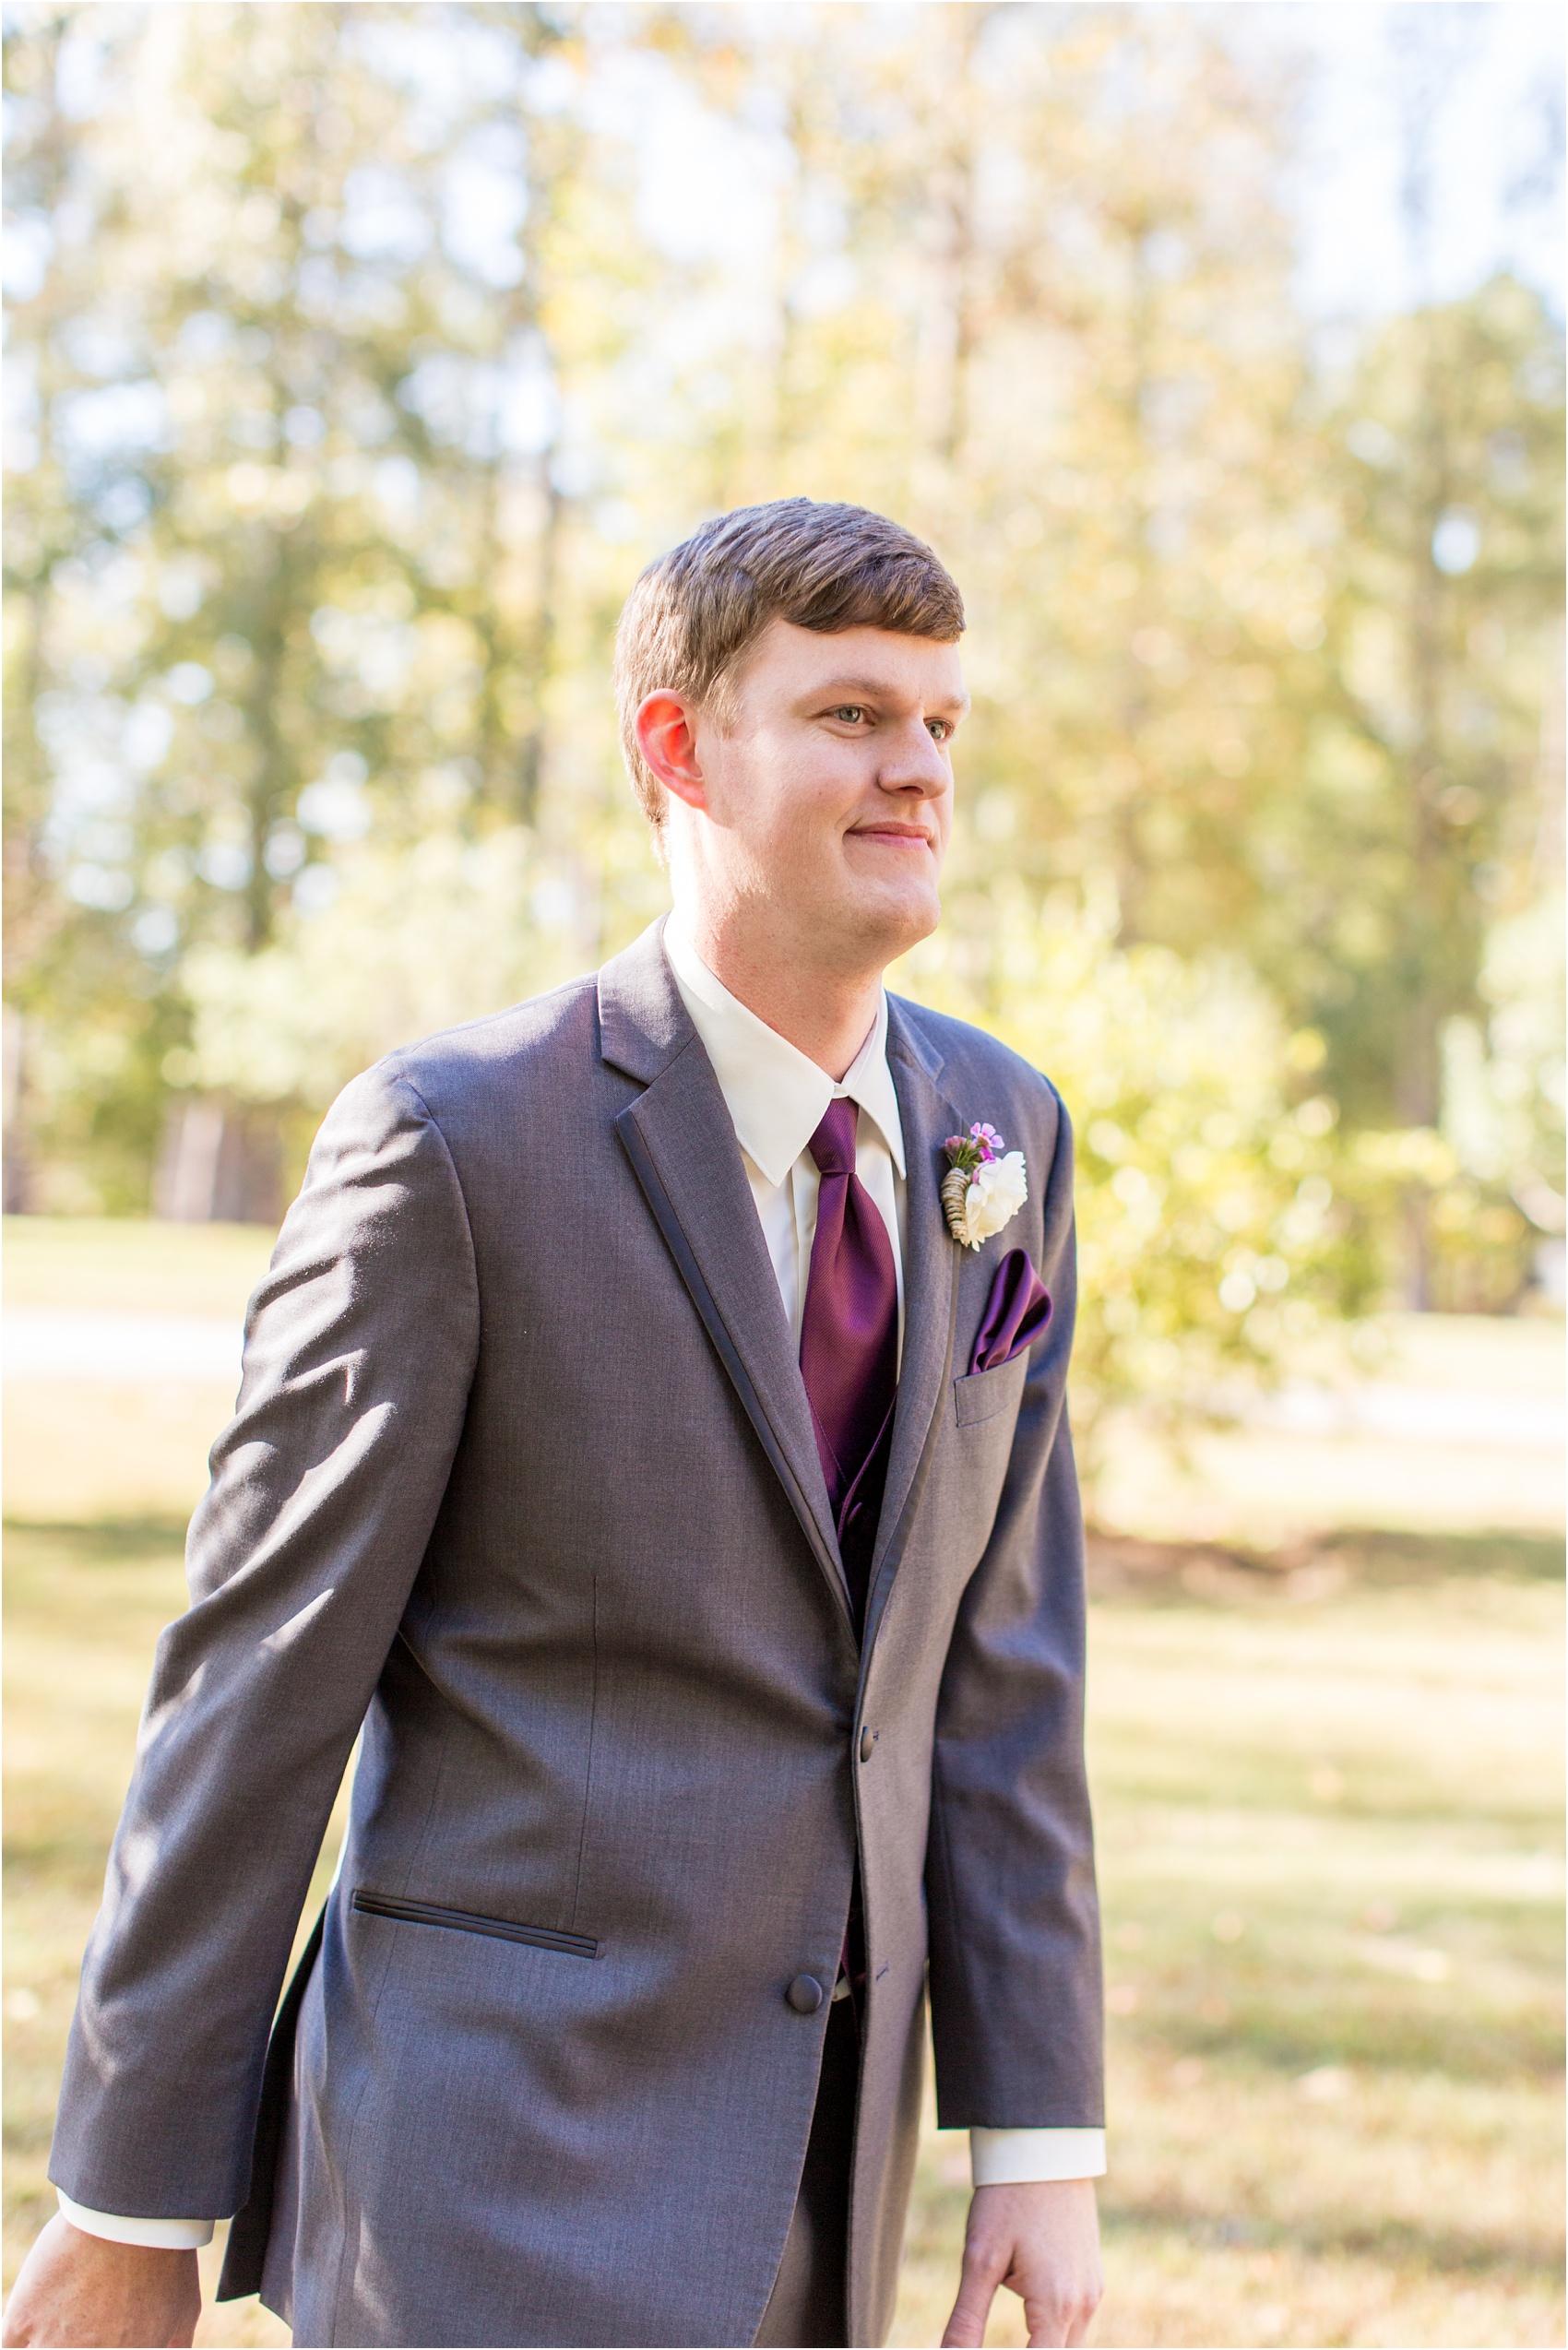 Savannah Eve Photography- Perkins Wedding- Blog-12.jpg